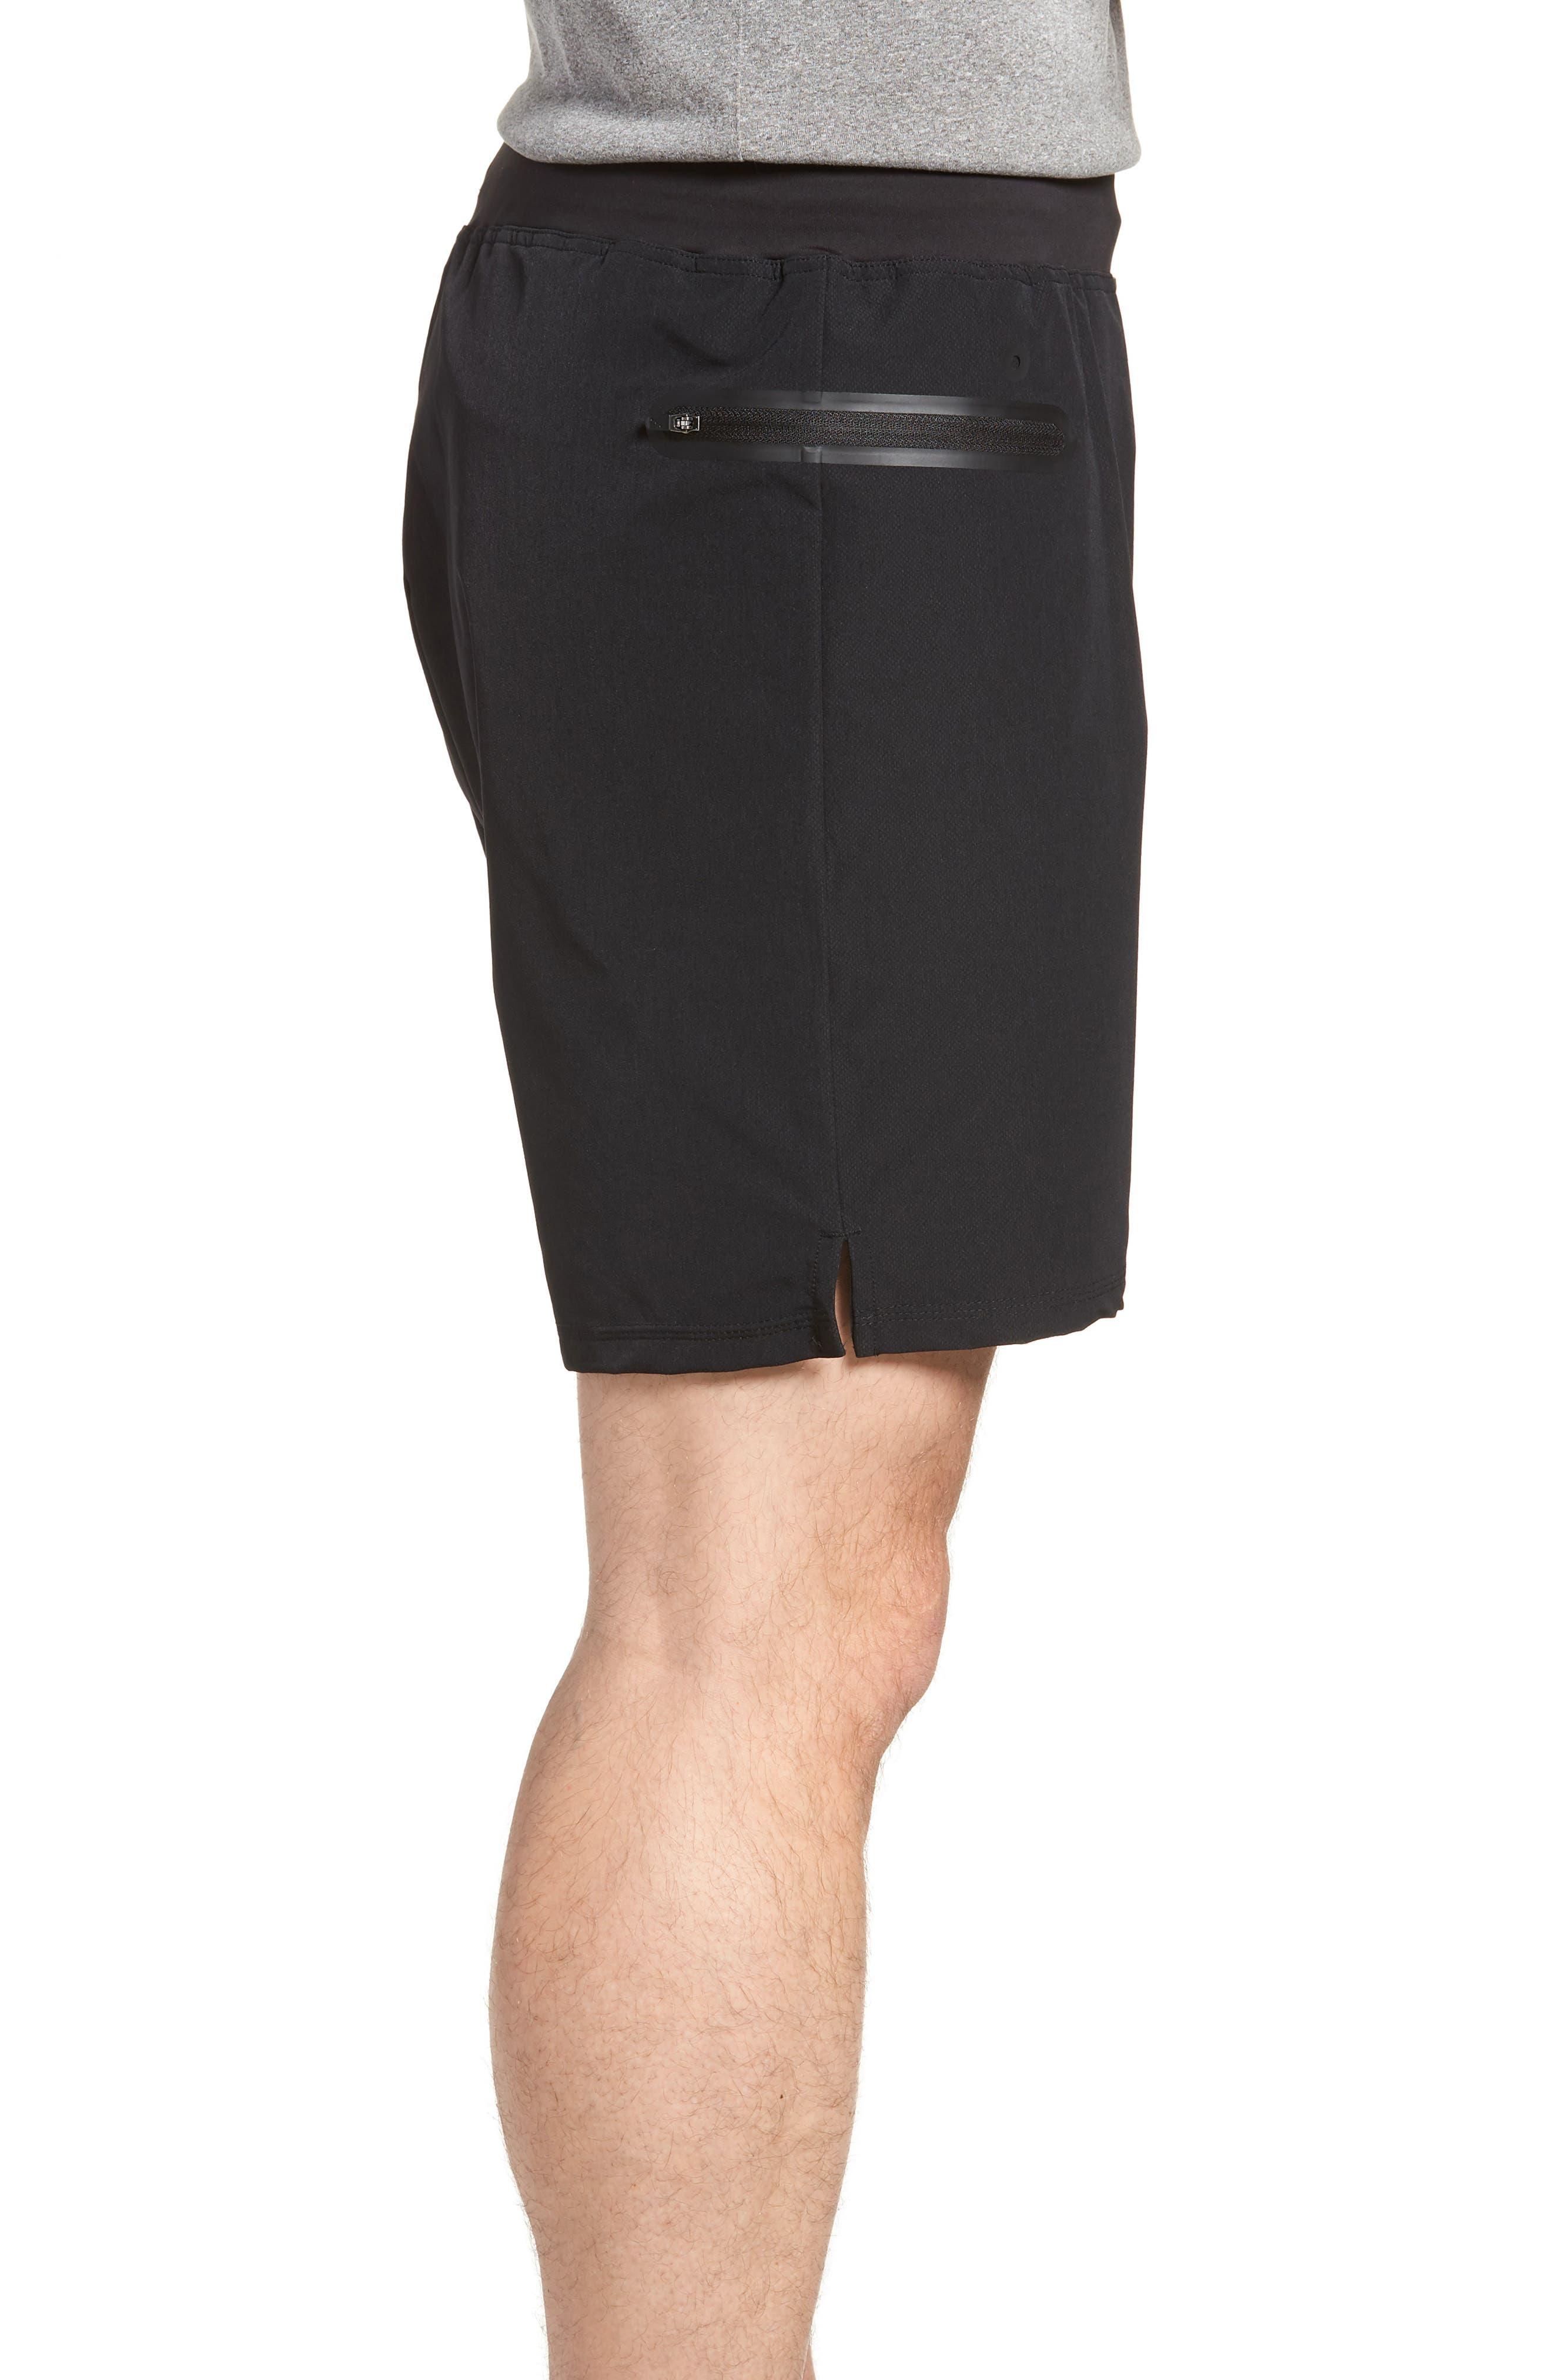 ZANEROBE Type 1 Shorts,                             Alternate thumbnail 3, color,                             001